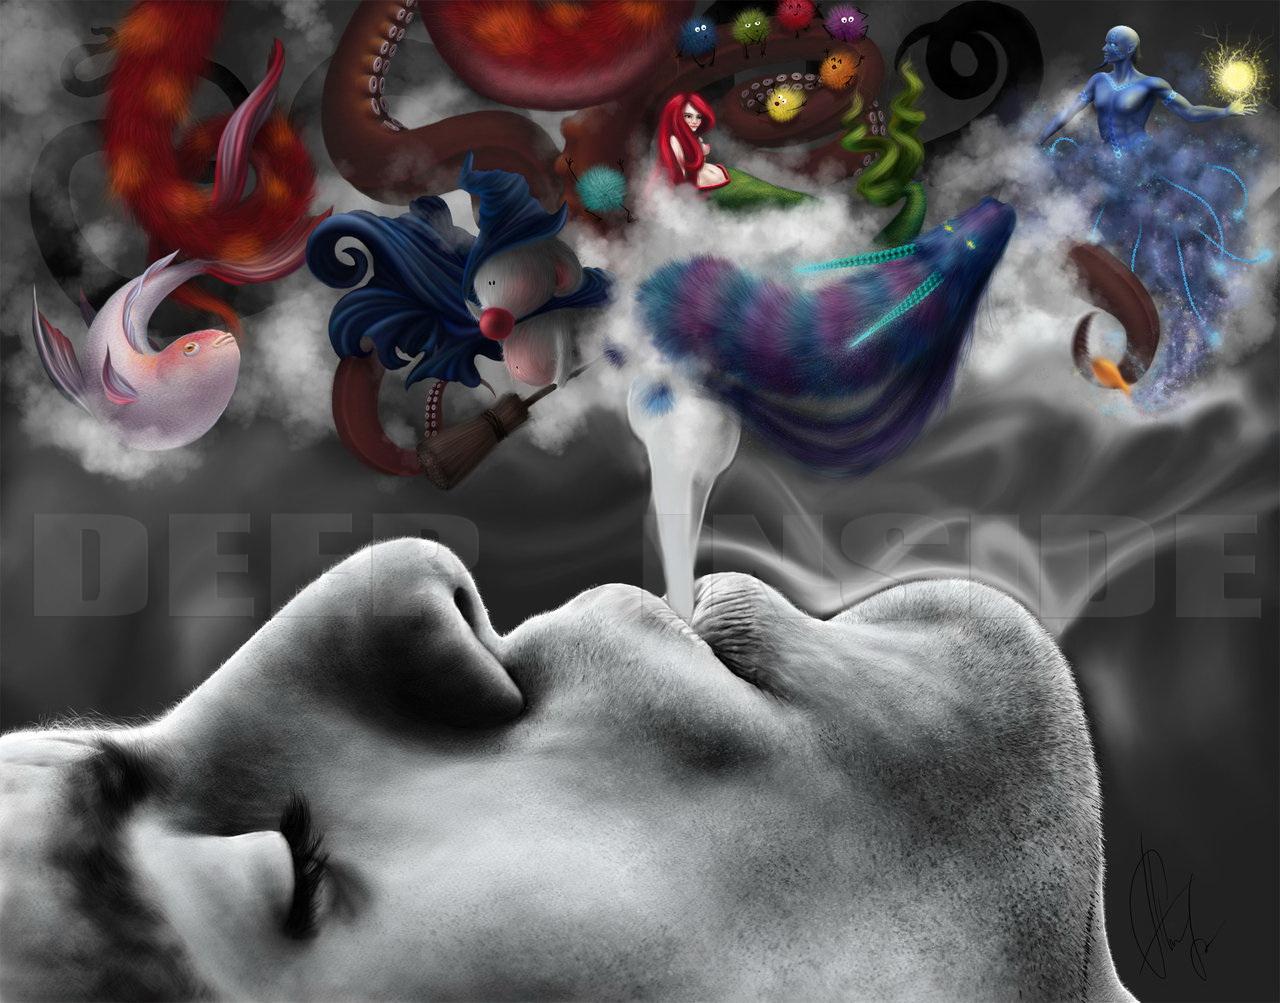 http://i1.sndcdn.com/artworks-000014952994-mw9y4h-original.jpg?eaa2527